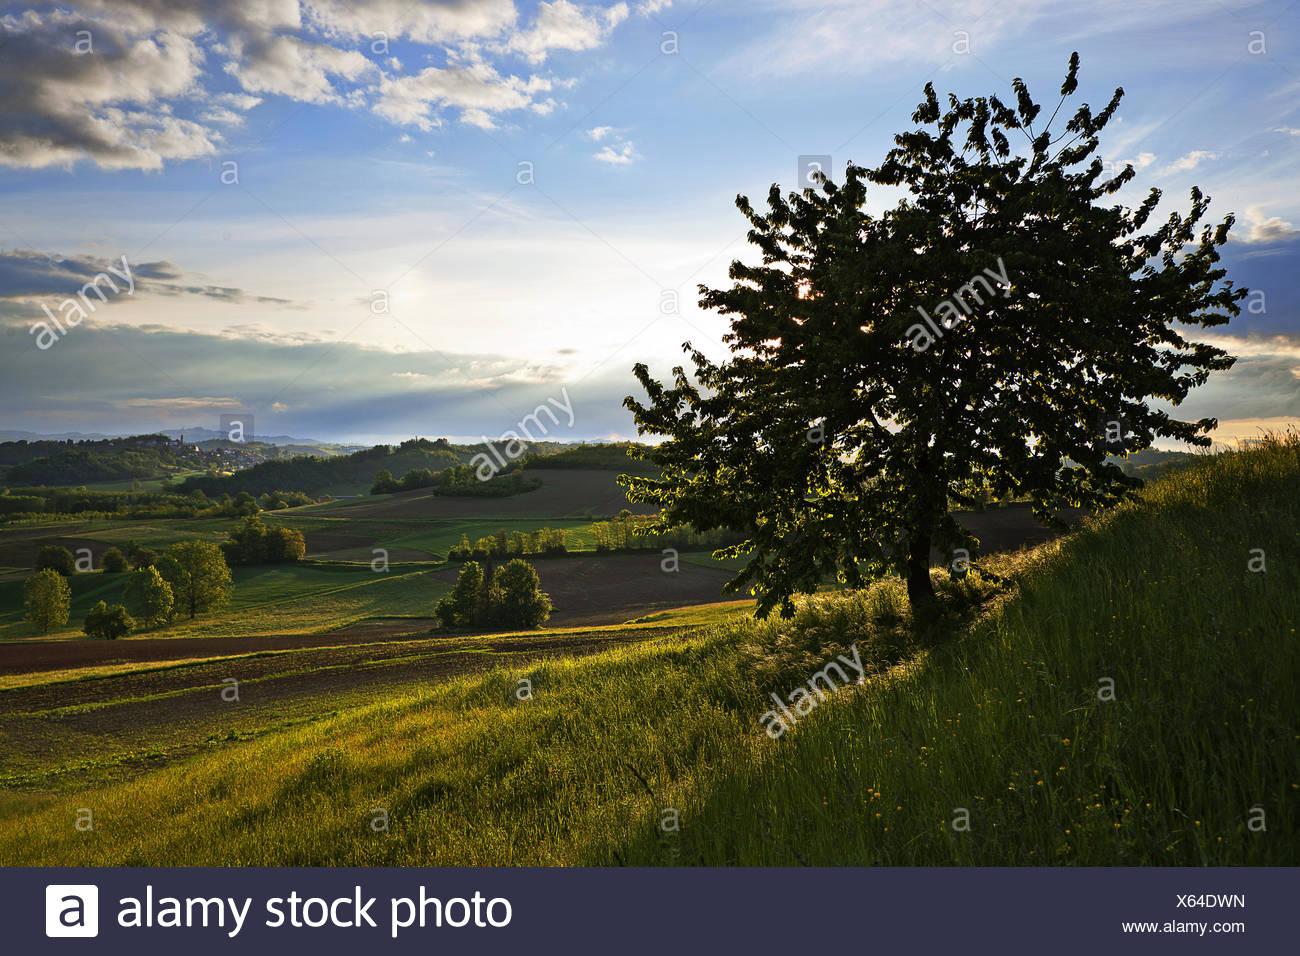 View from Montechiaro d'Asti, Piemont, Italy - Stock Image